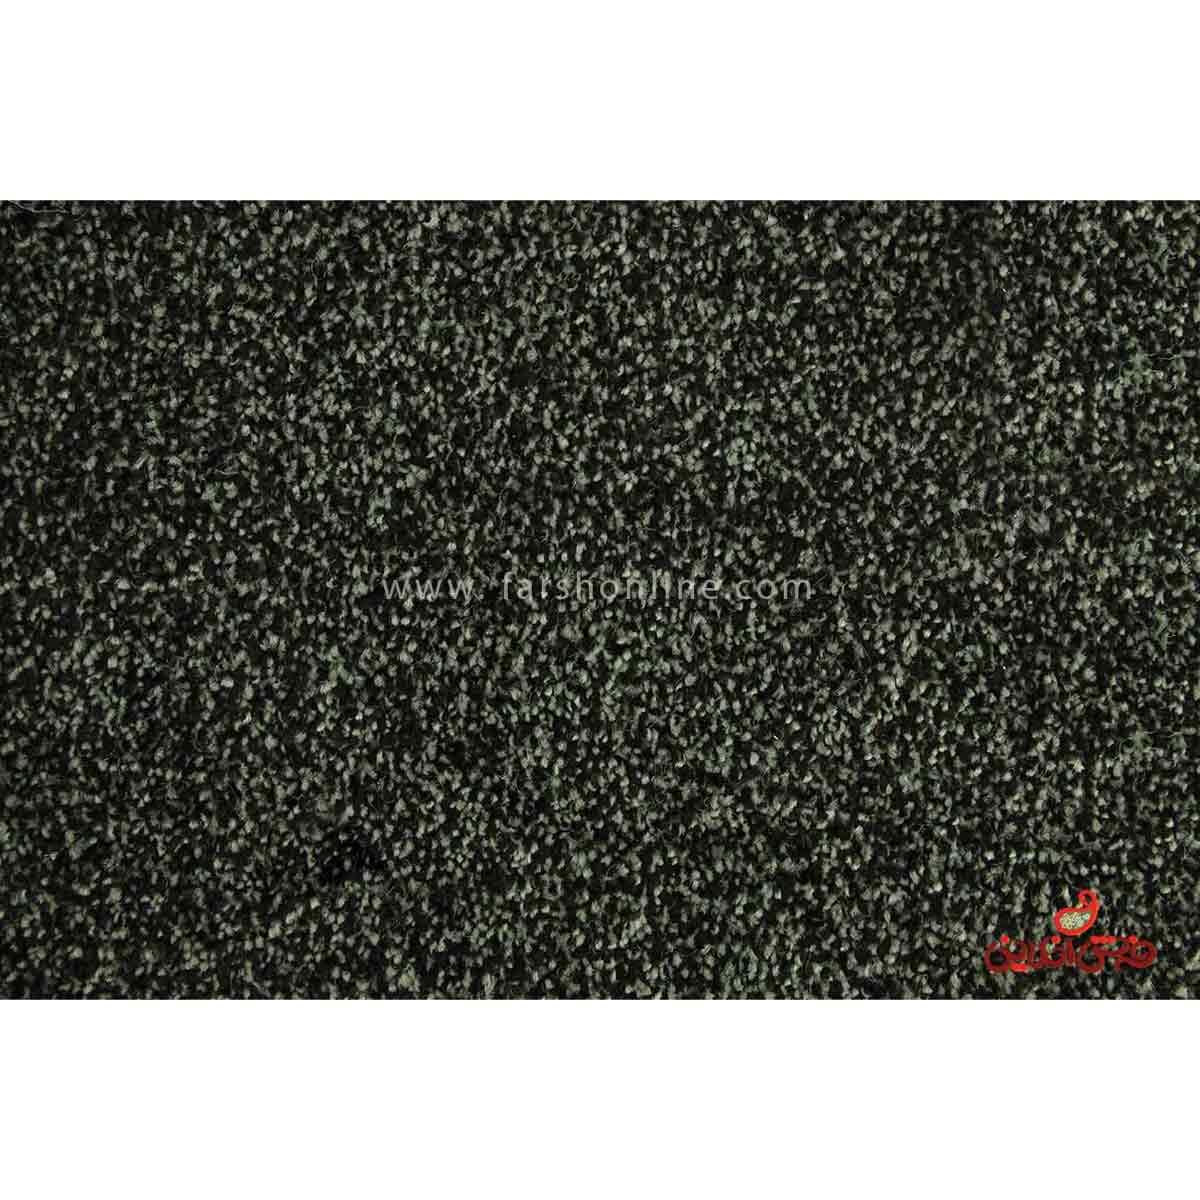 موکت ظریف مصور طرح رویال زیتونی کد 5102